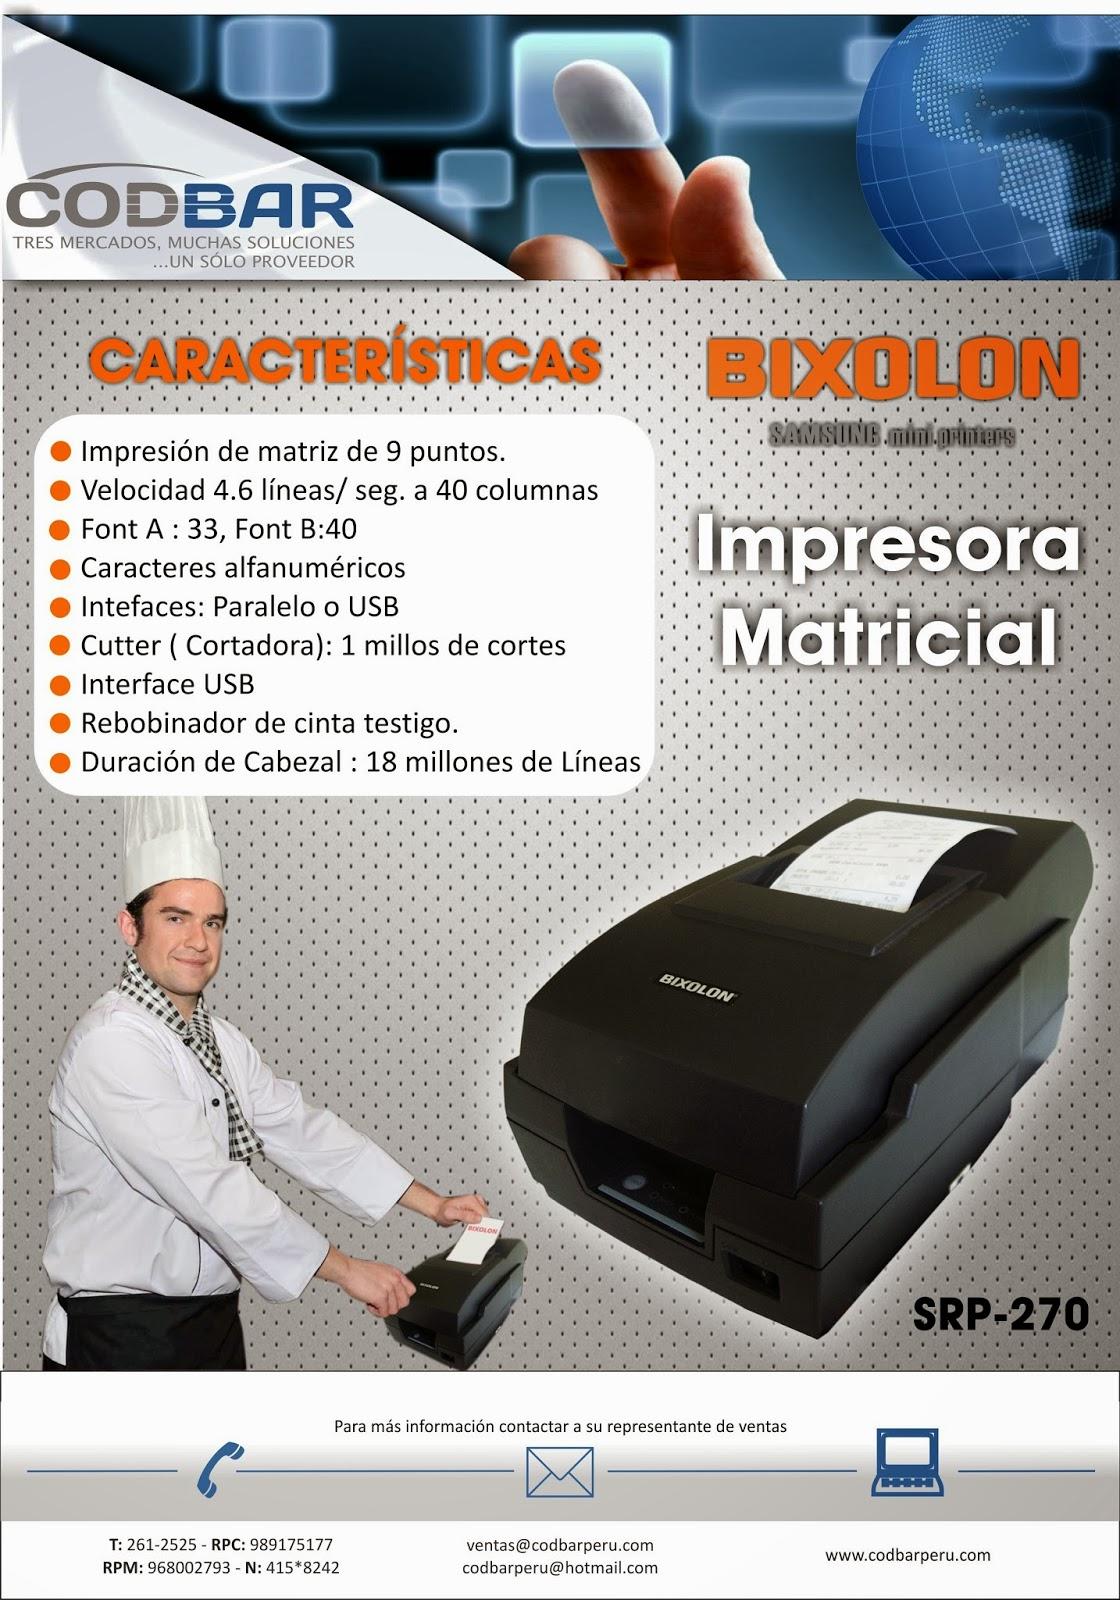 Codbar Productos Impresora Matricial Bixolon Srp 270 Para